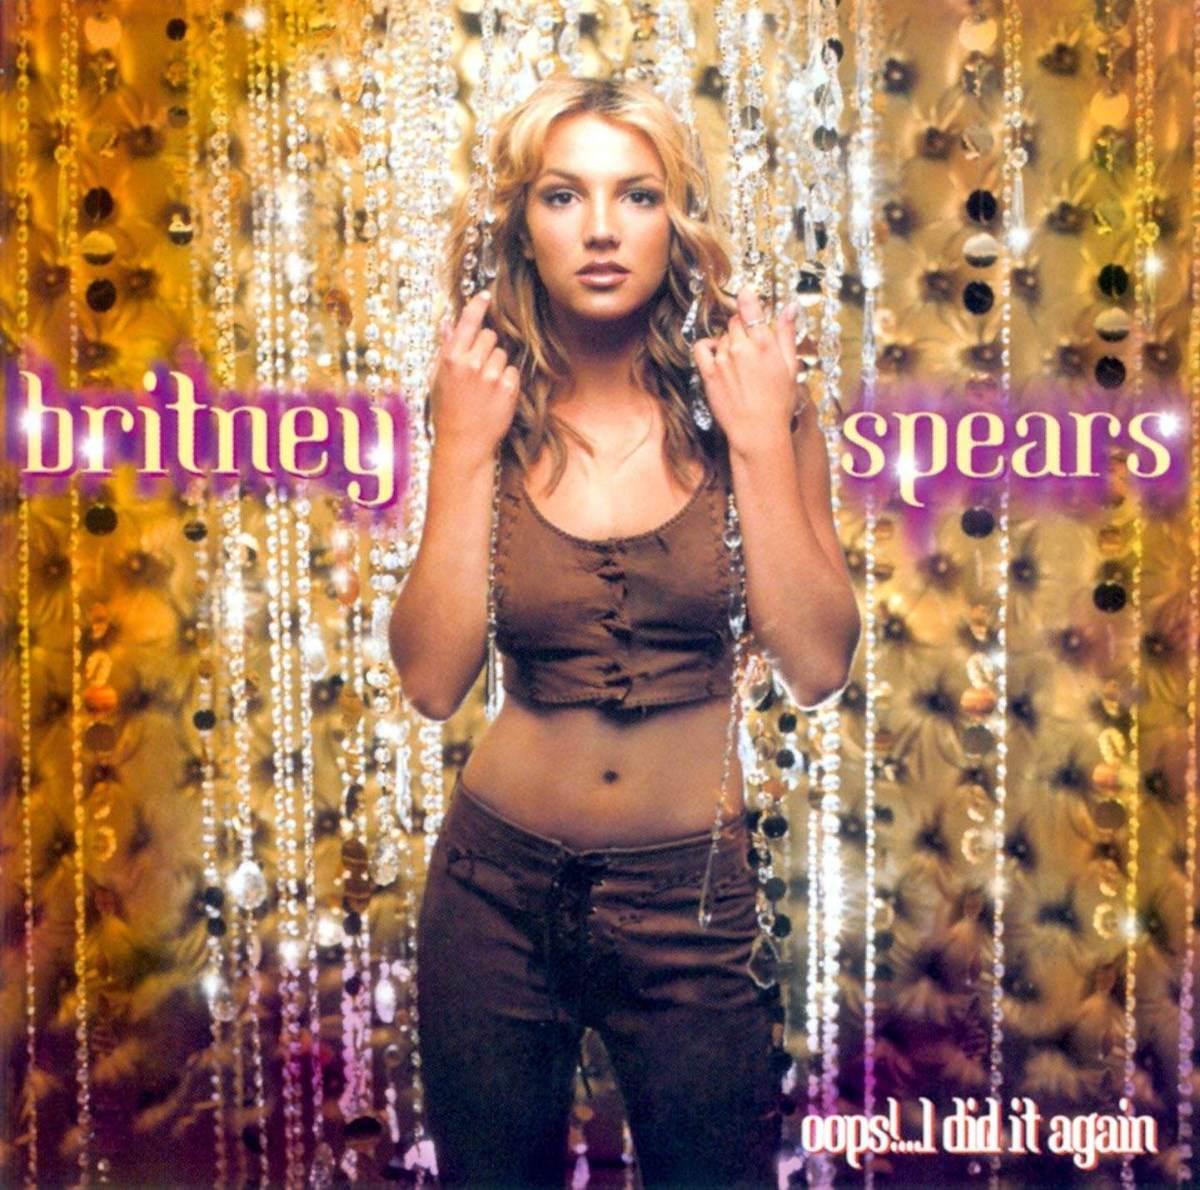 cd-lacrado-britney-spears-oops-i-did-it-again-2000-D_NQ_NP_13678-MLB20079417533_042014-F.jpg